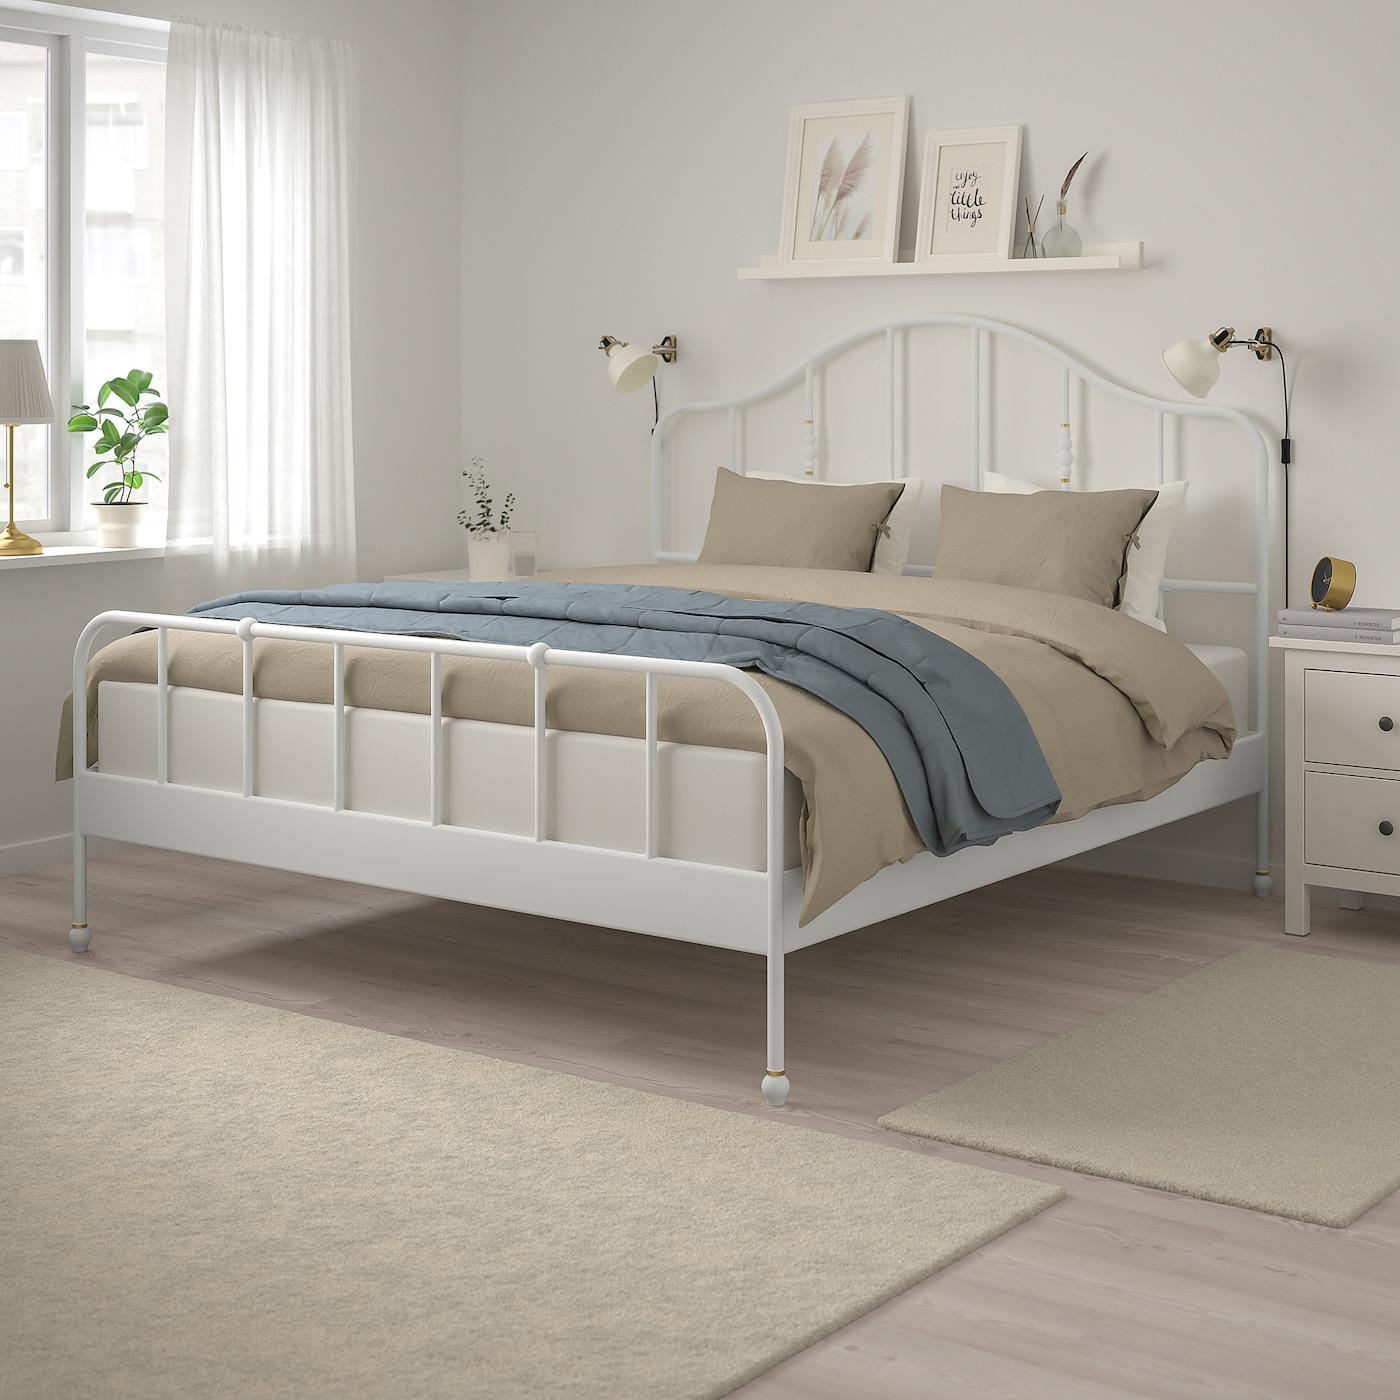 Sagstua Bed Frame White Lönset Ikea